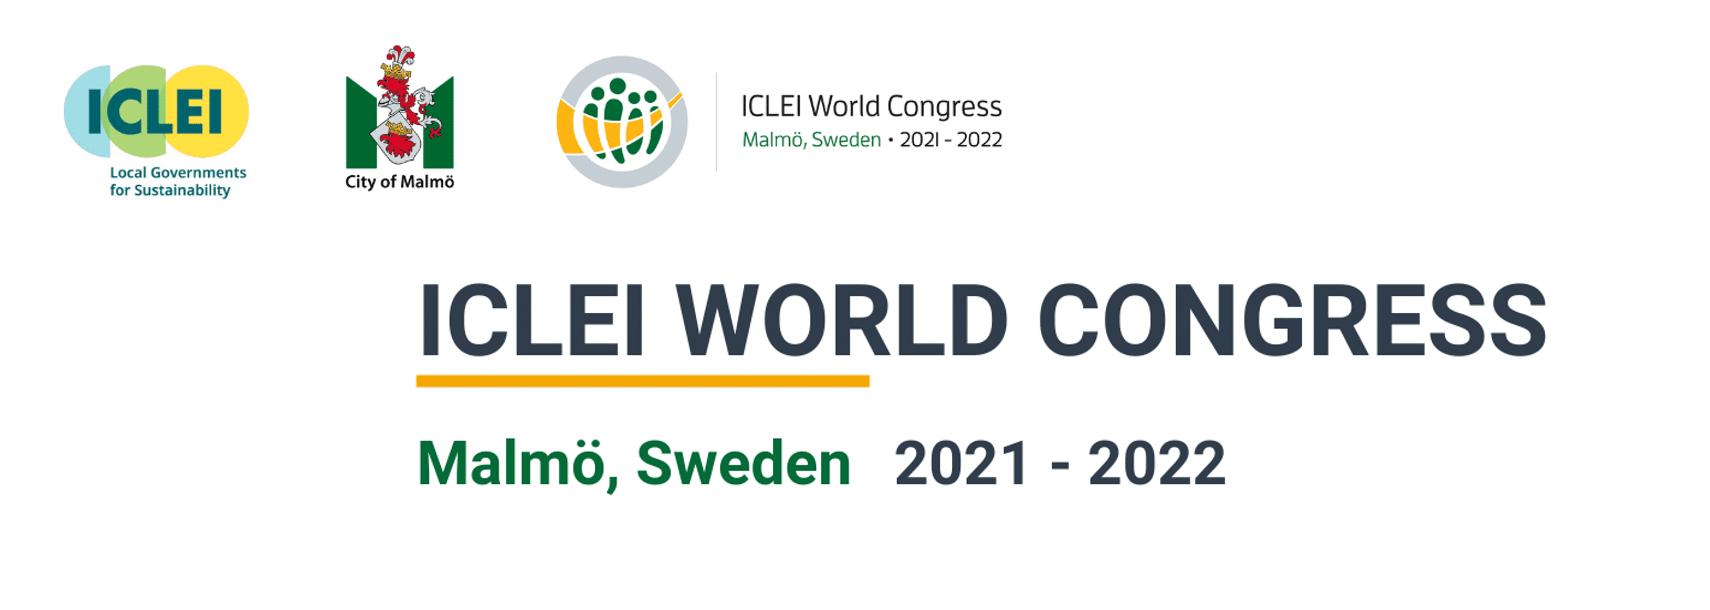 ICLEI World Congress 世界大會 2021-2022